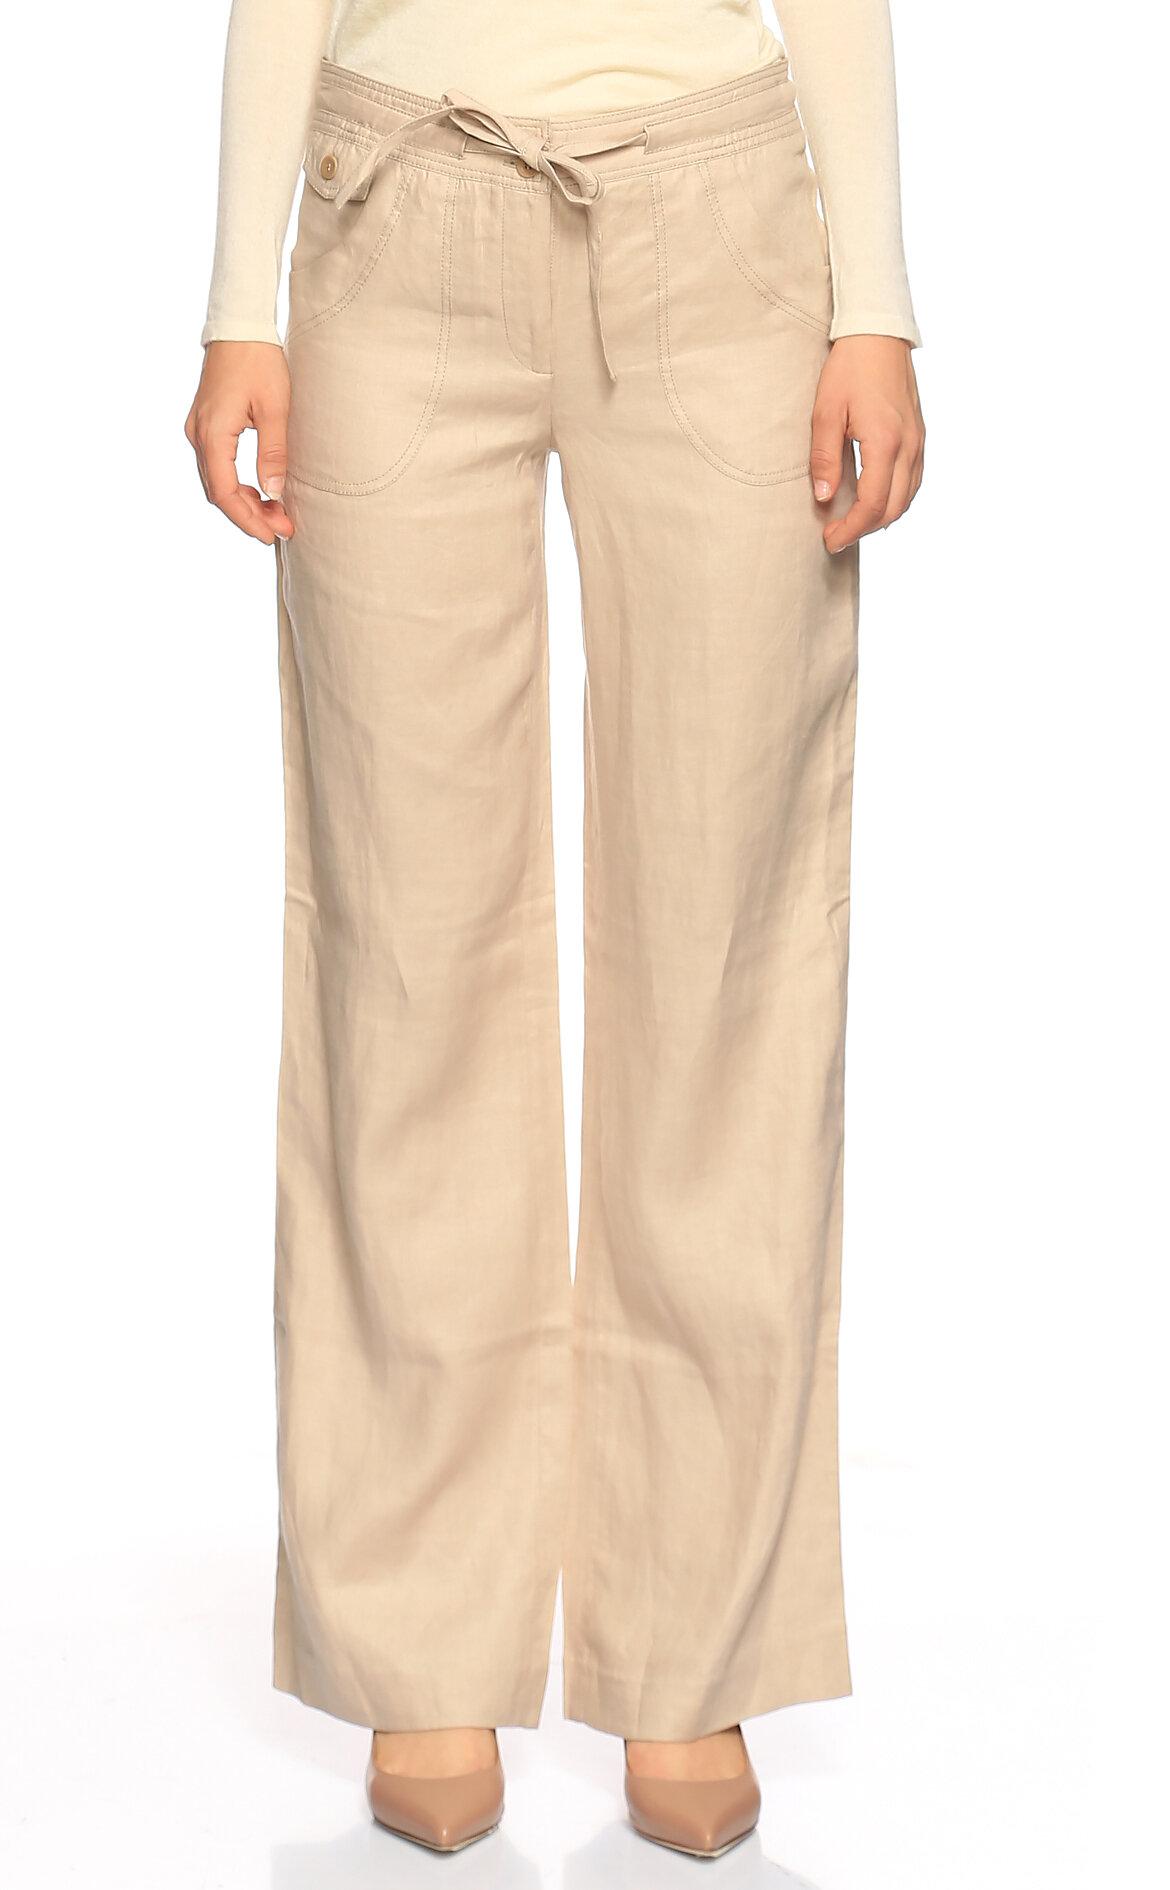 Gerard Darel-Gerard Darel Bej Rengi Cep Detaylı Bol Kesim Pantolon